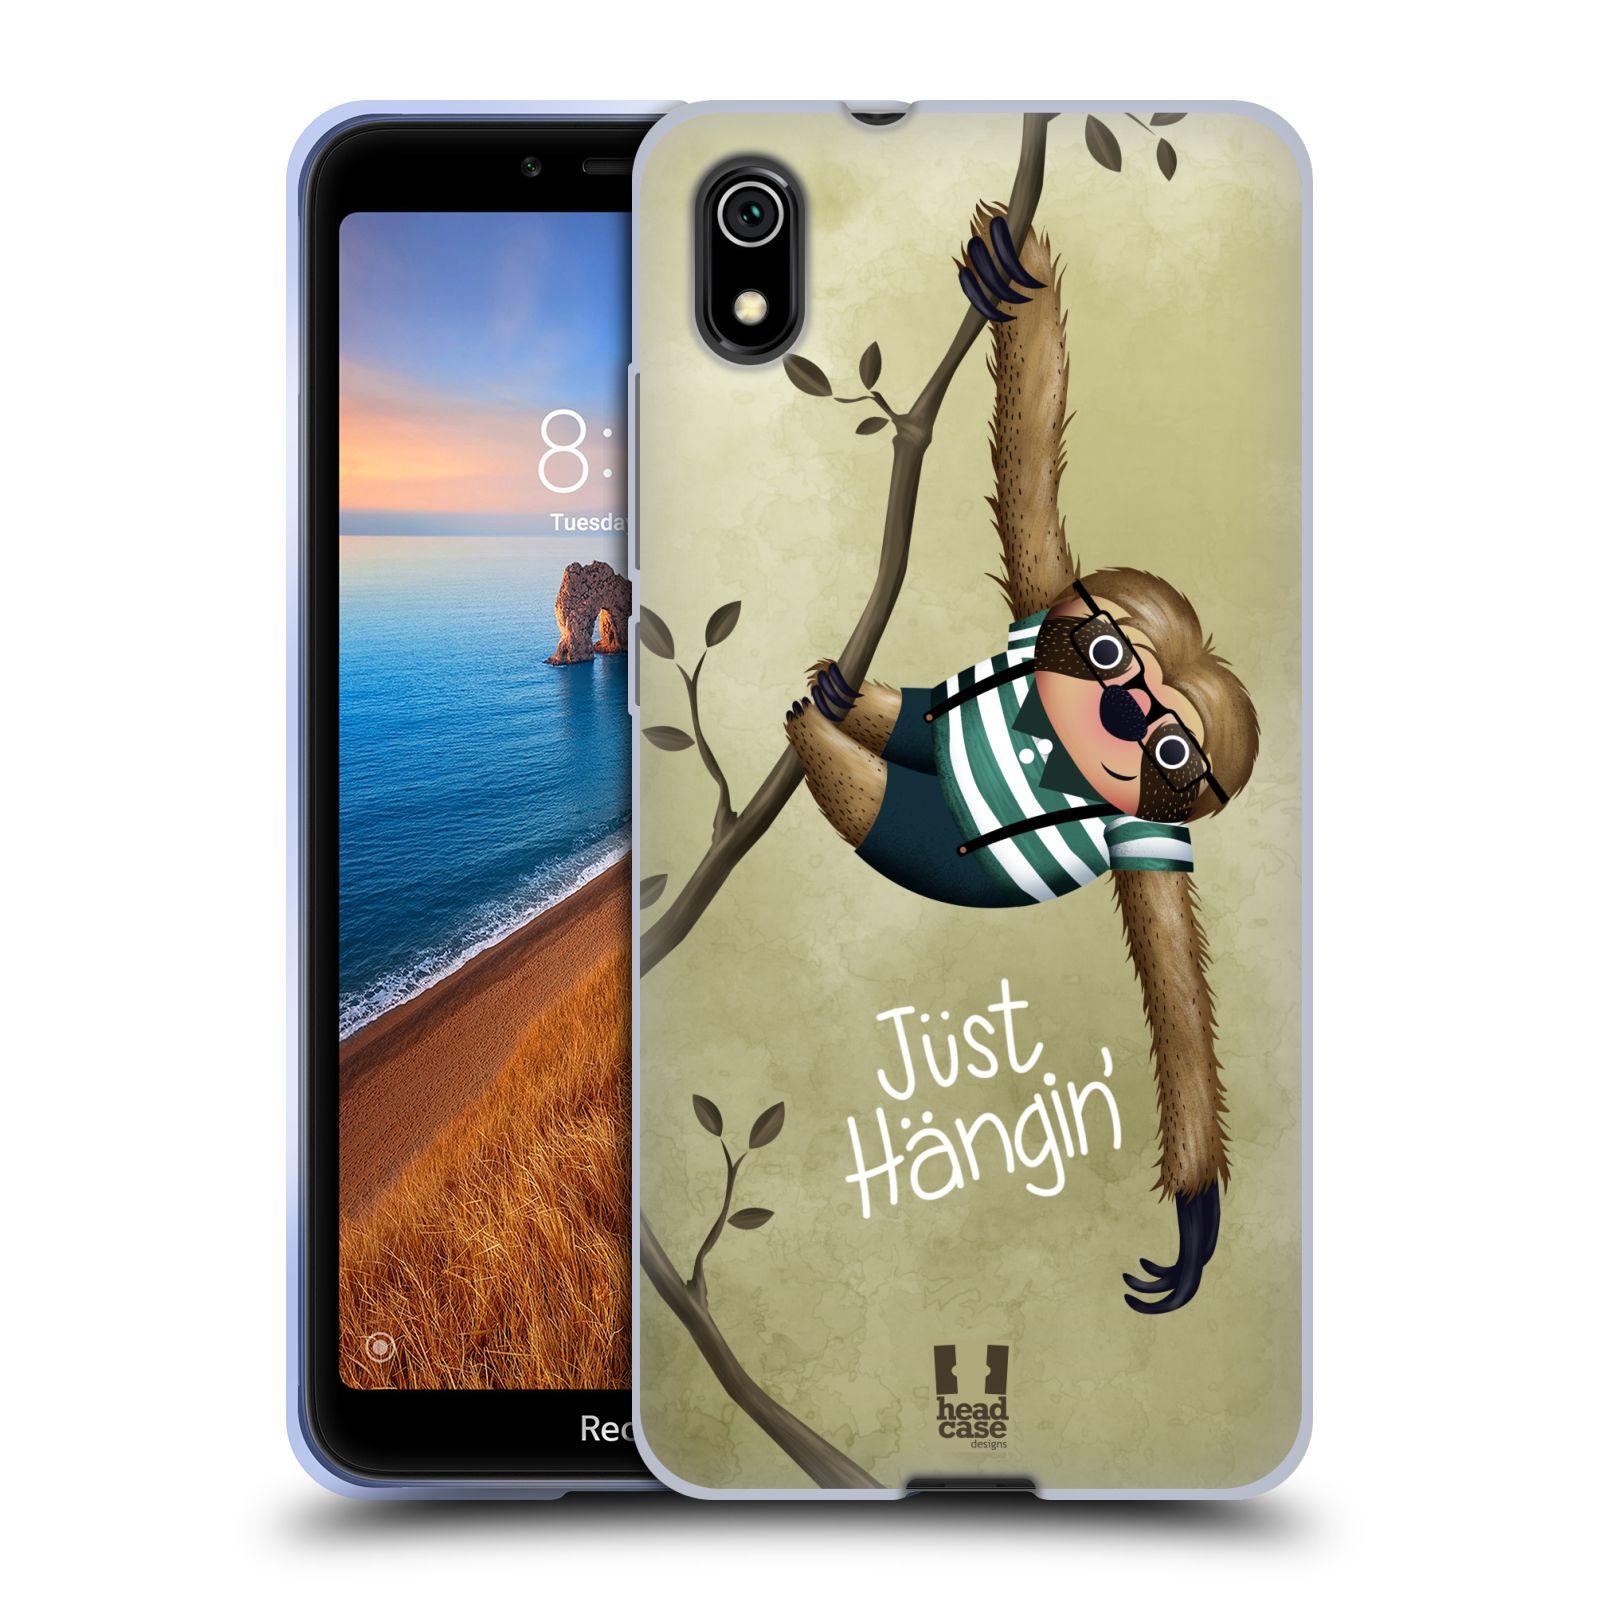 Silikonové pouzdro na mobil Redmi 7A - Head Case - Lenochod Just Hangin